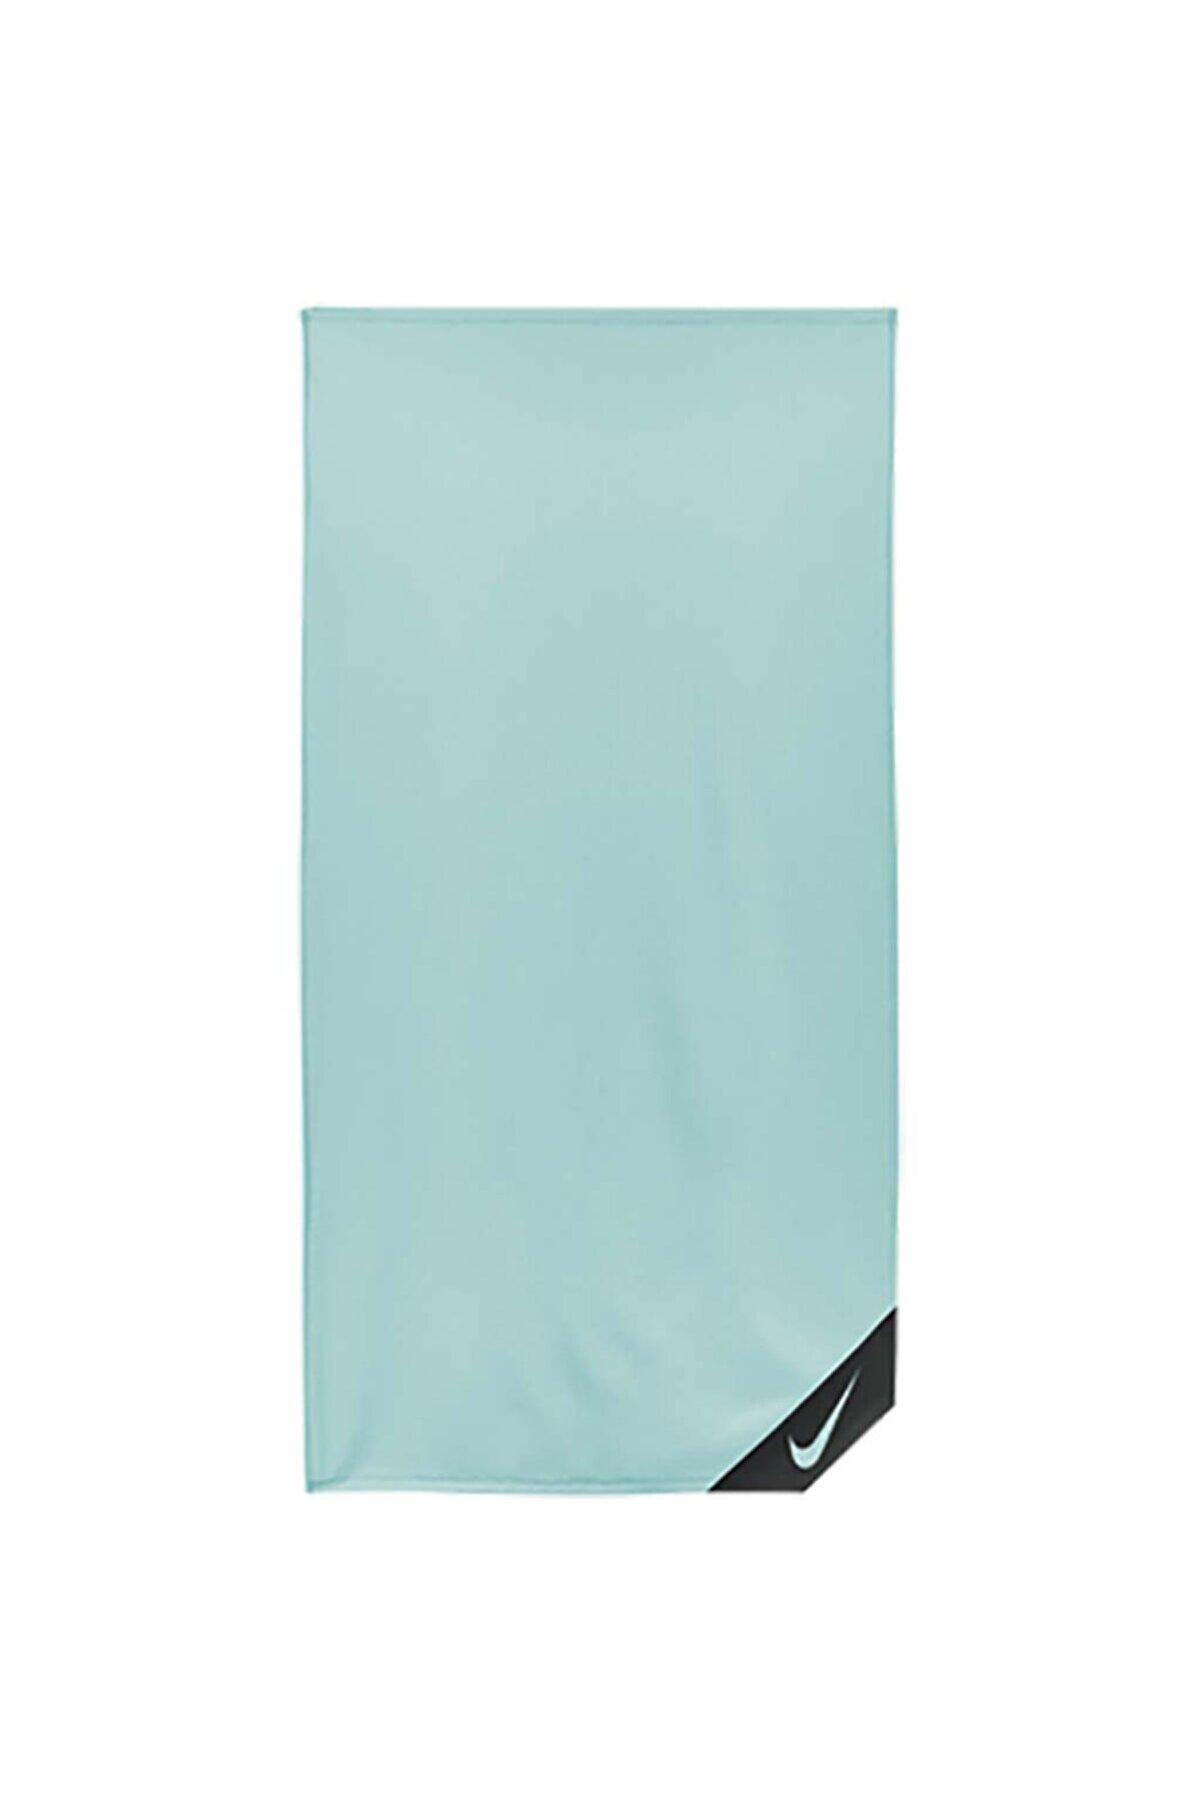 Nike Cooling Towel Small Teal Unisex Mavi Antrenman Havlusu N.000.0005.310.ns